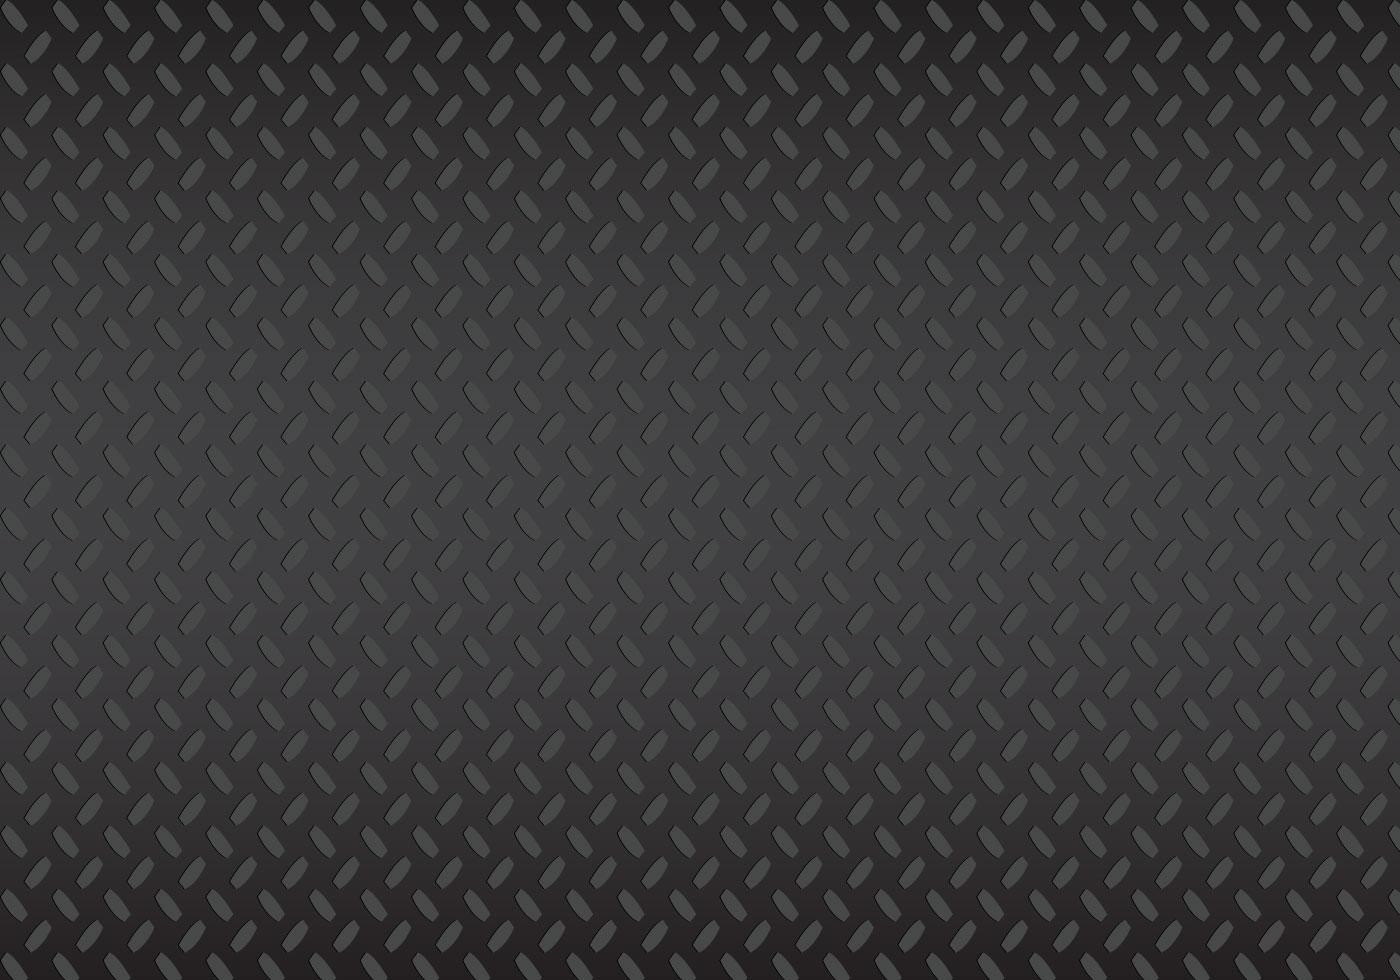 Black Diamond Plate Wallpaper Free Black Metal Vector Download Free Vector Art Stock